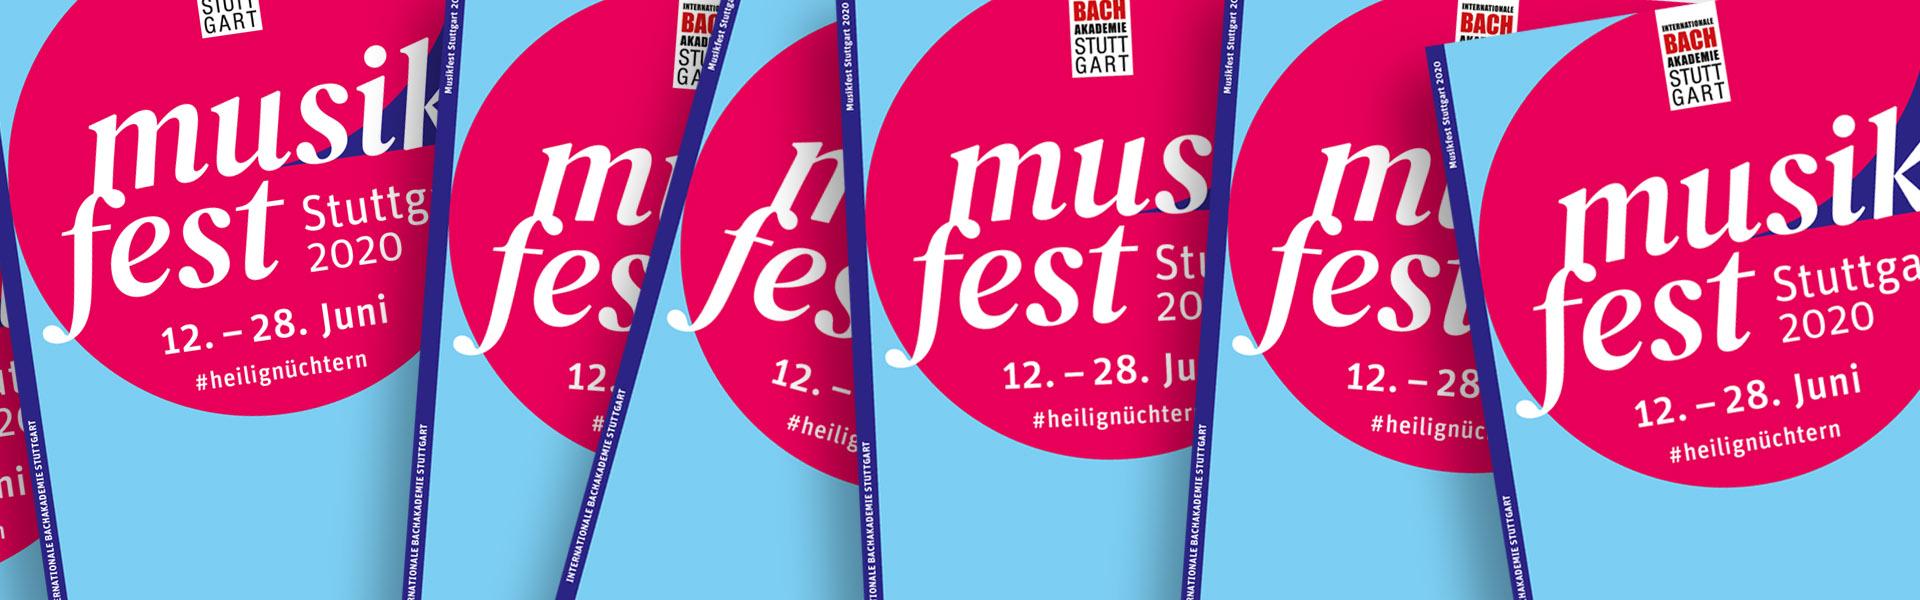 Download Musikfest-Broschüre